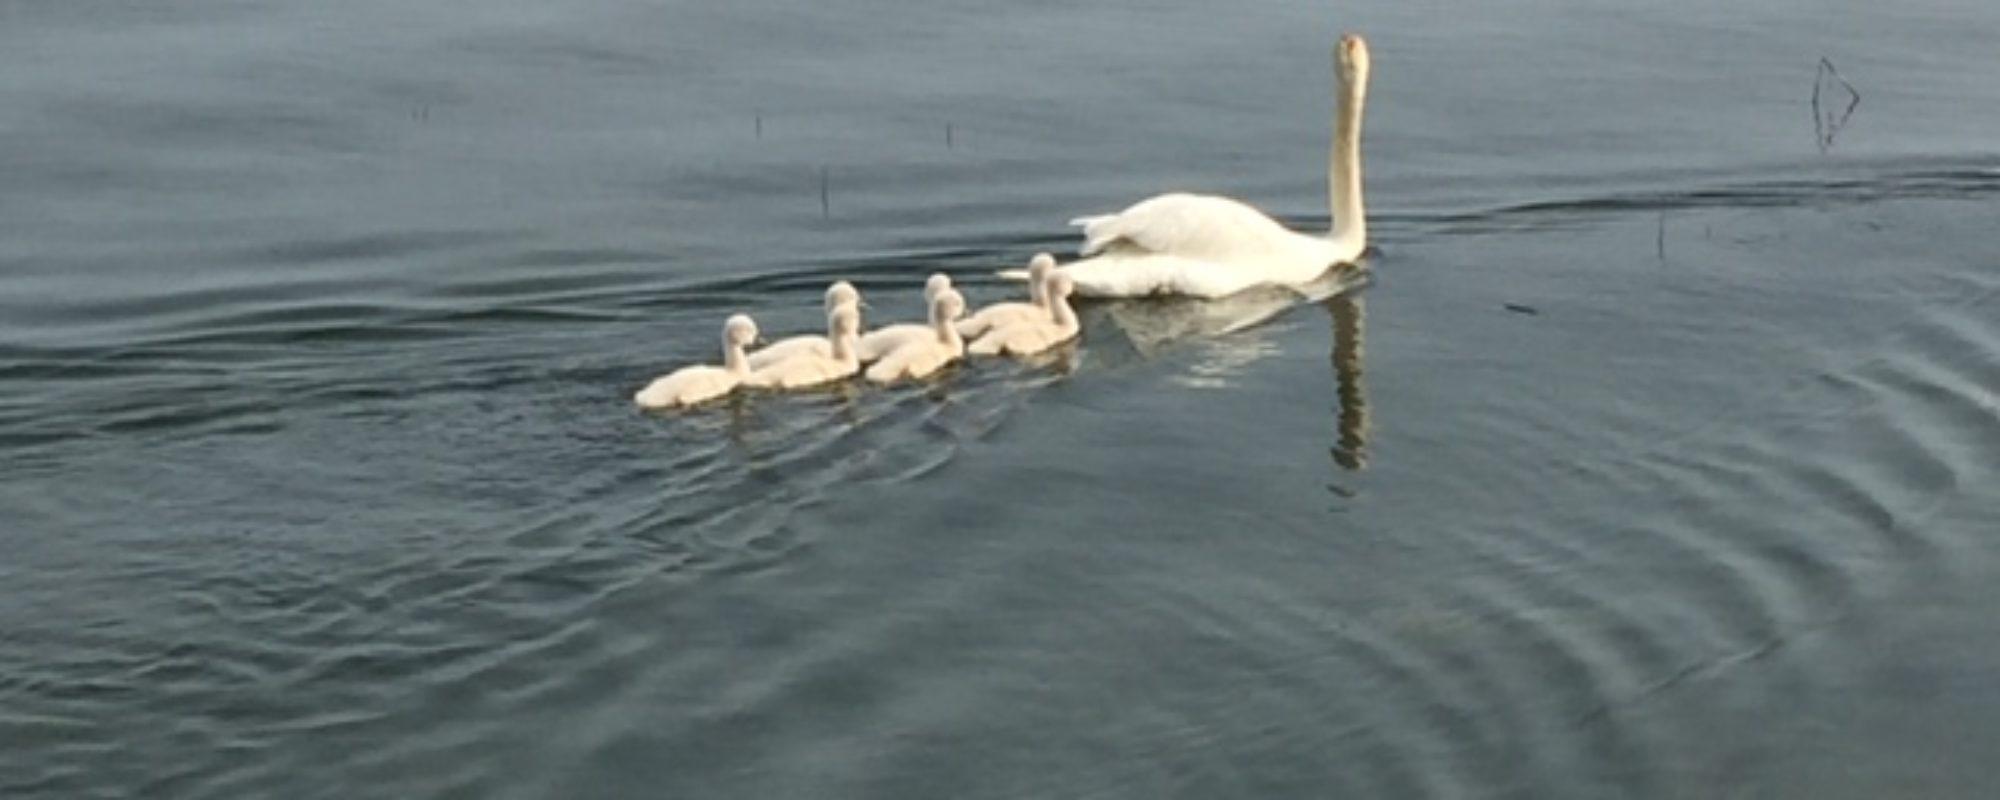 pond of swans